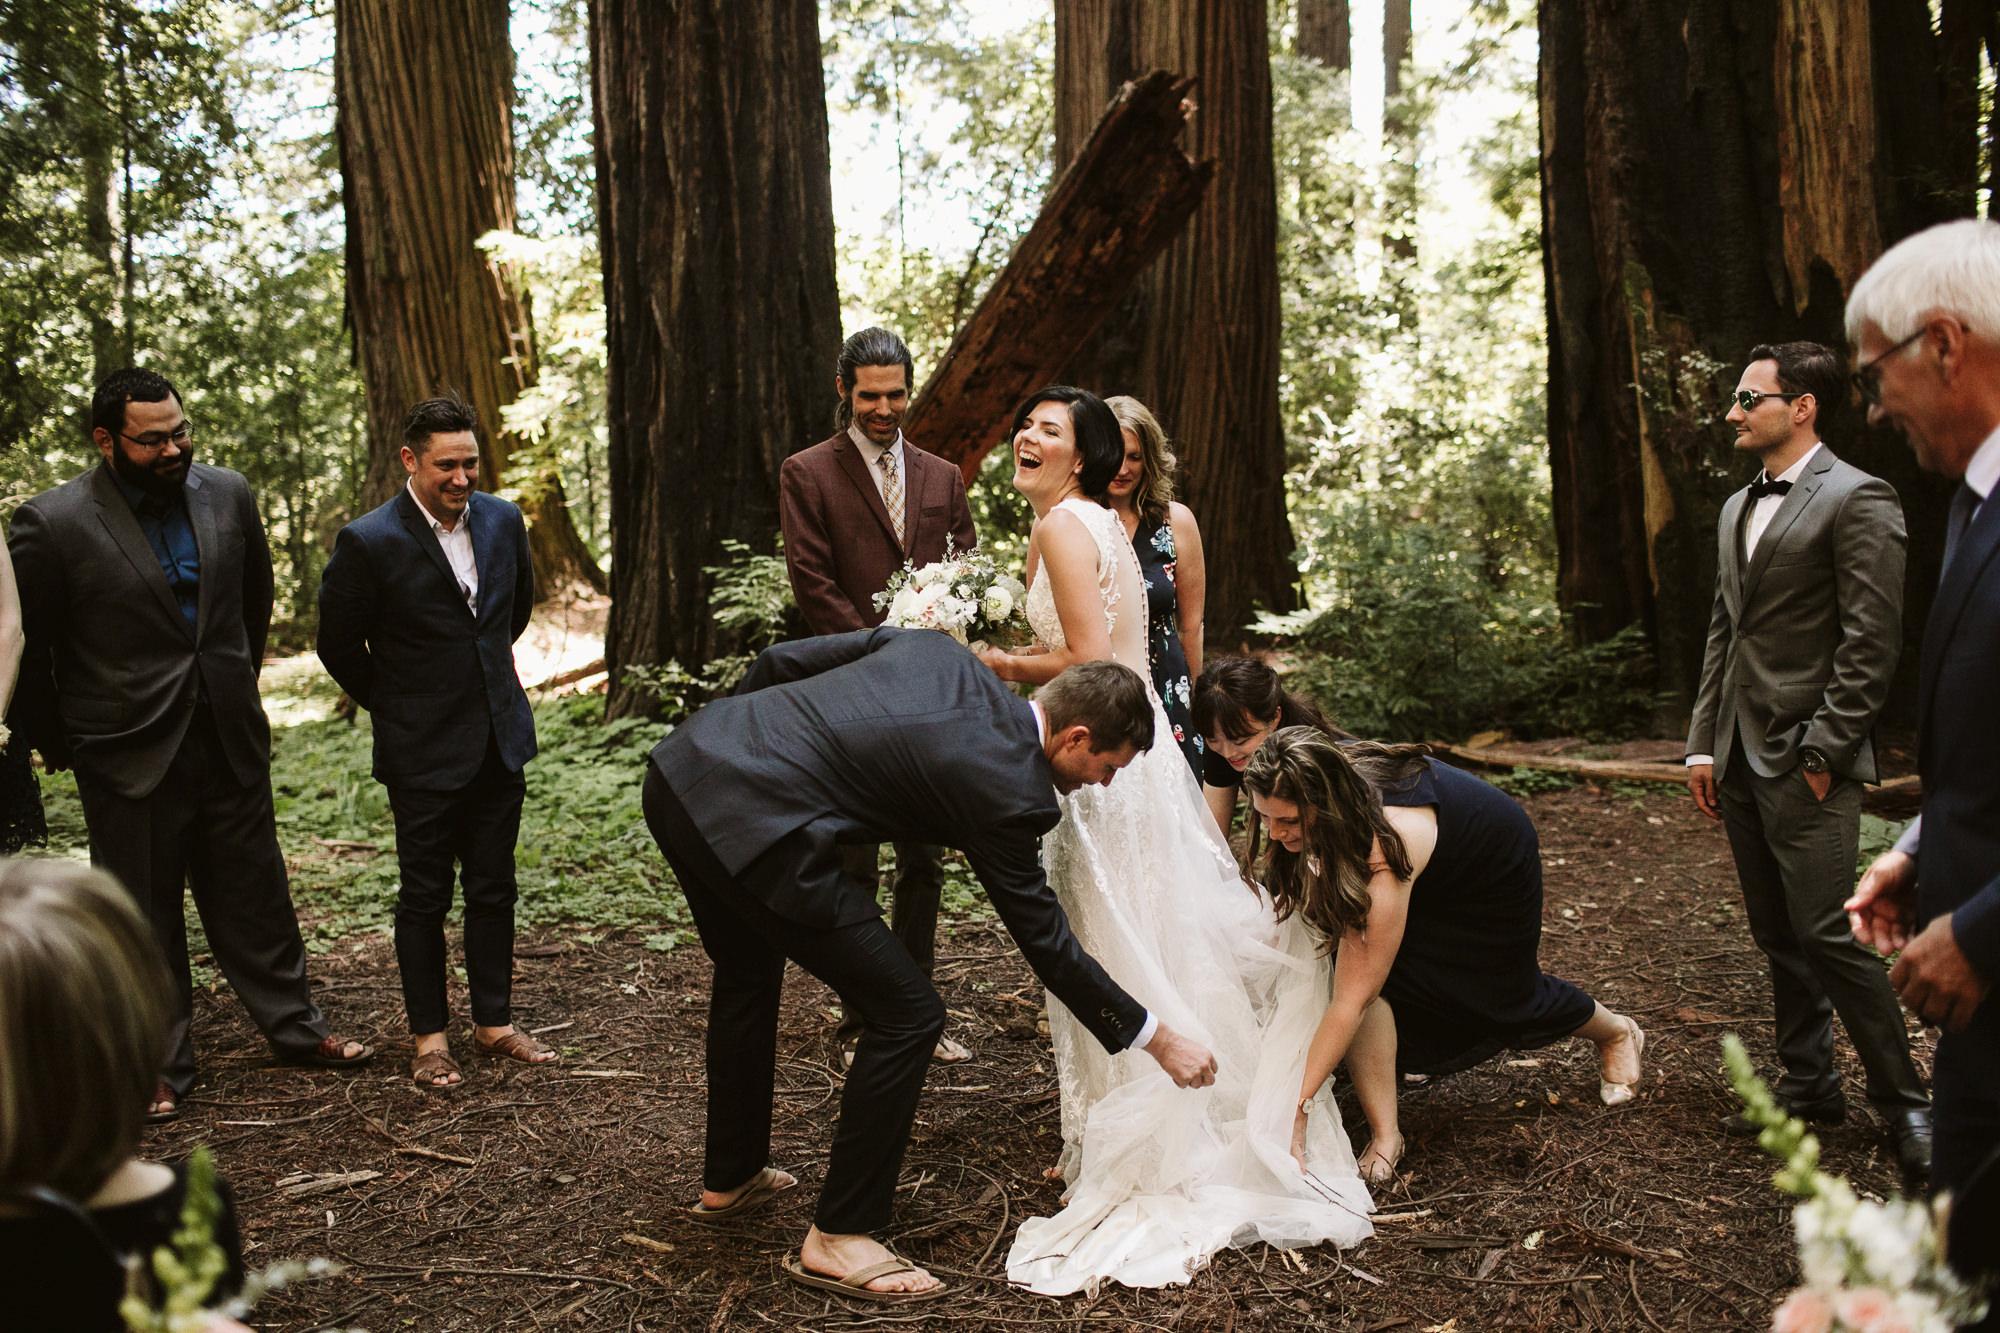 California-wedding-photographer-alfonso-flores-pamplin-groove-173.jpg